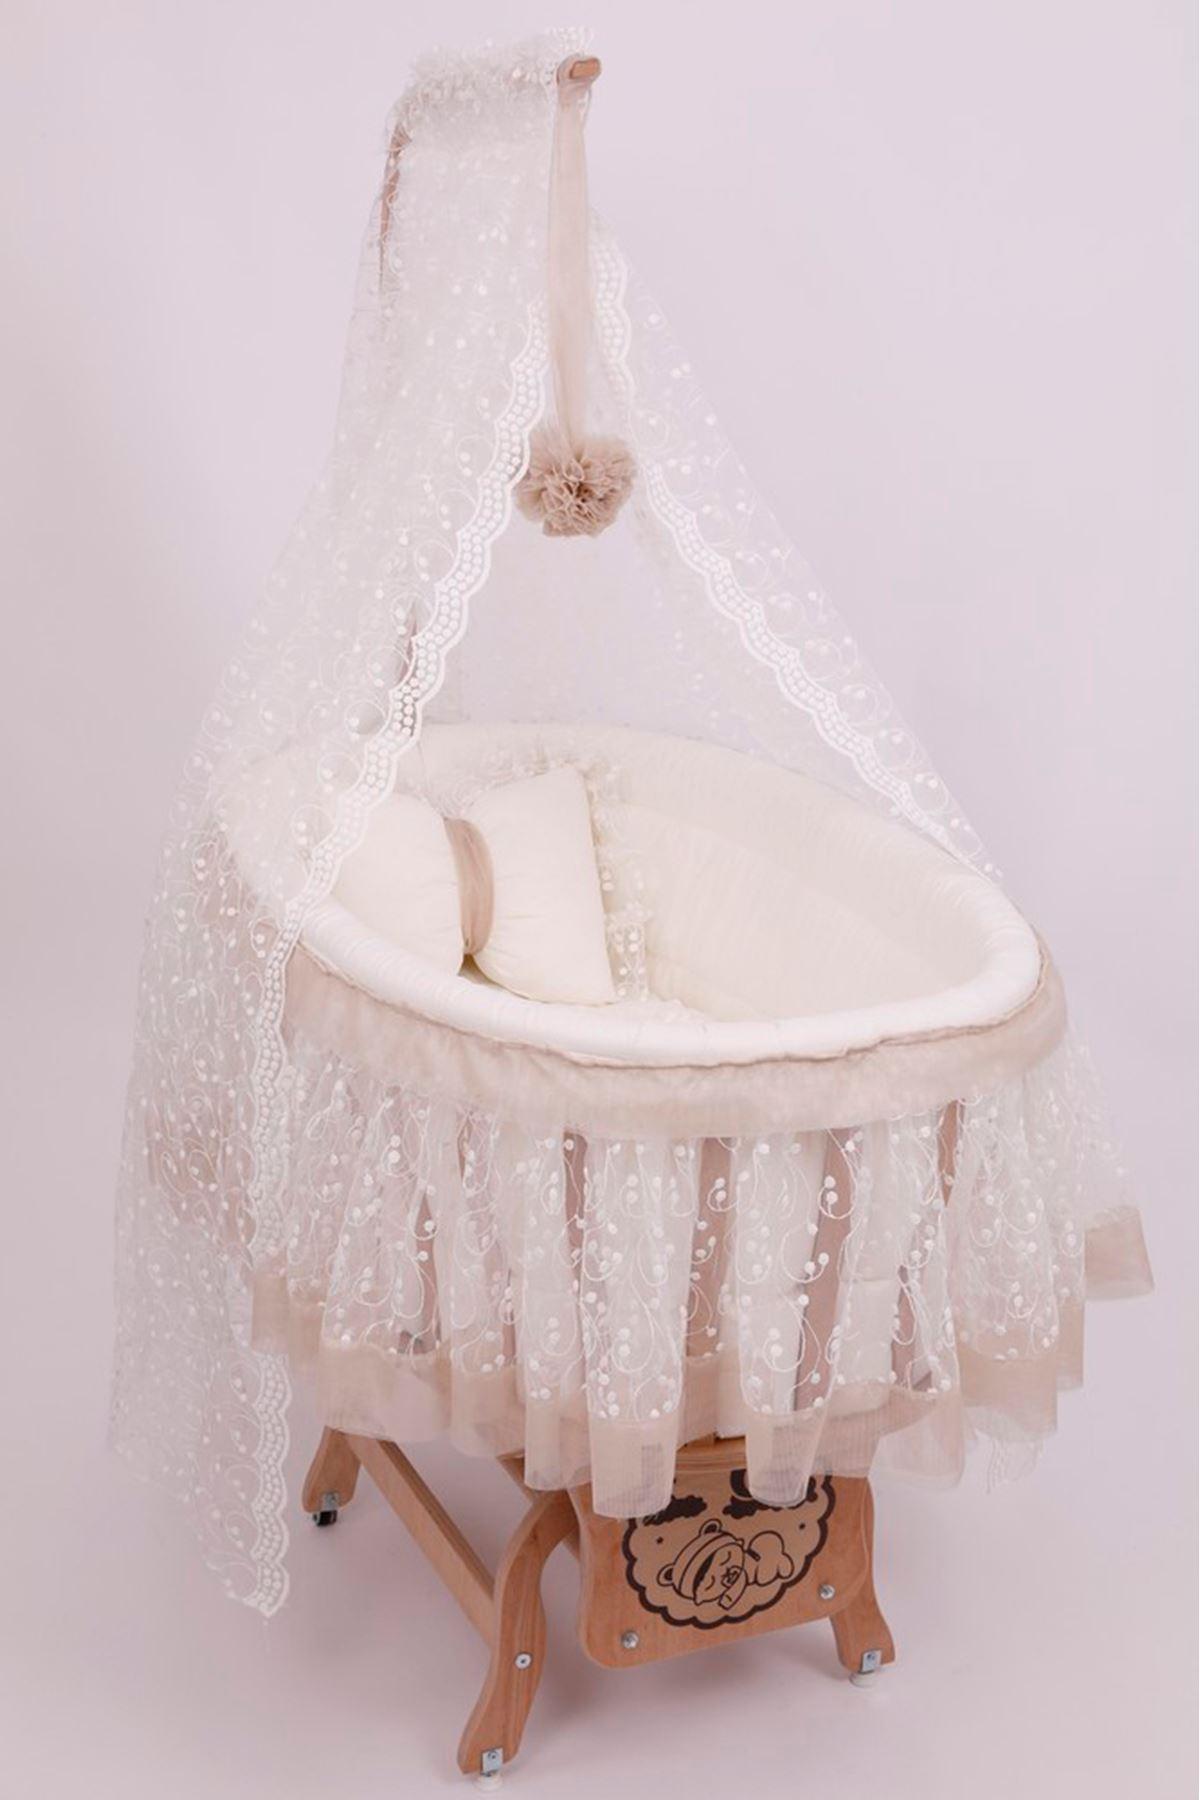 Brown Tobacco Skirt Basket Crib